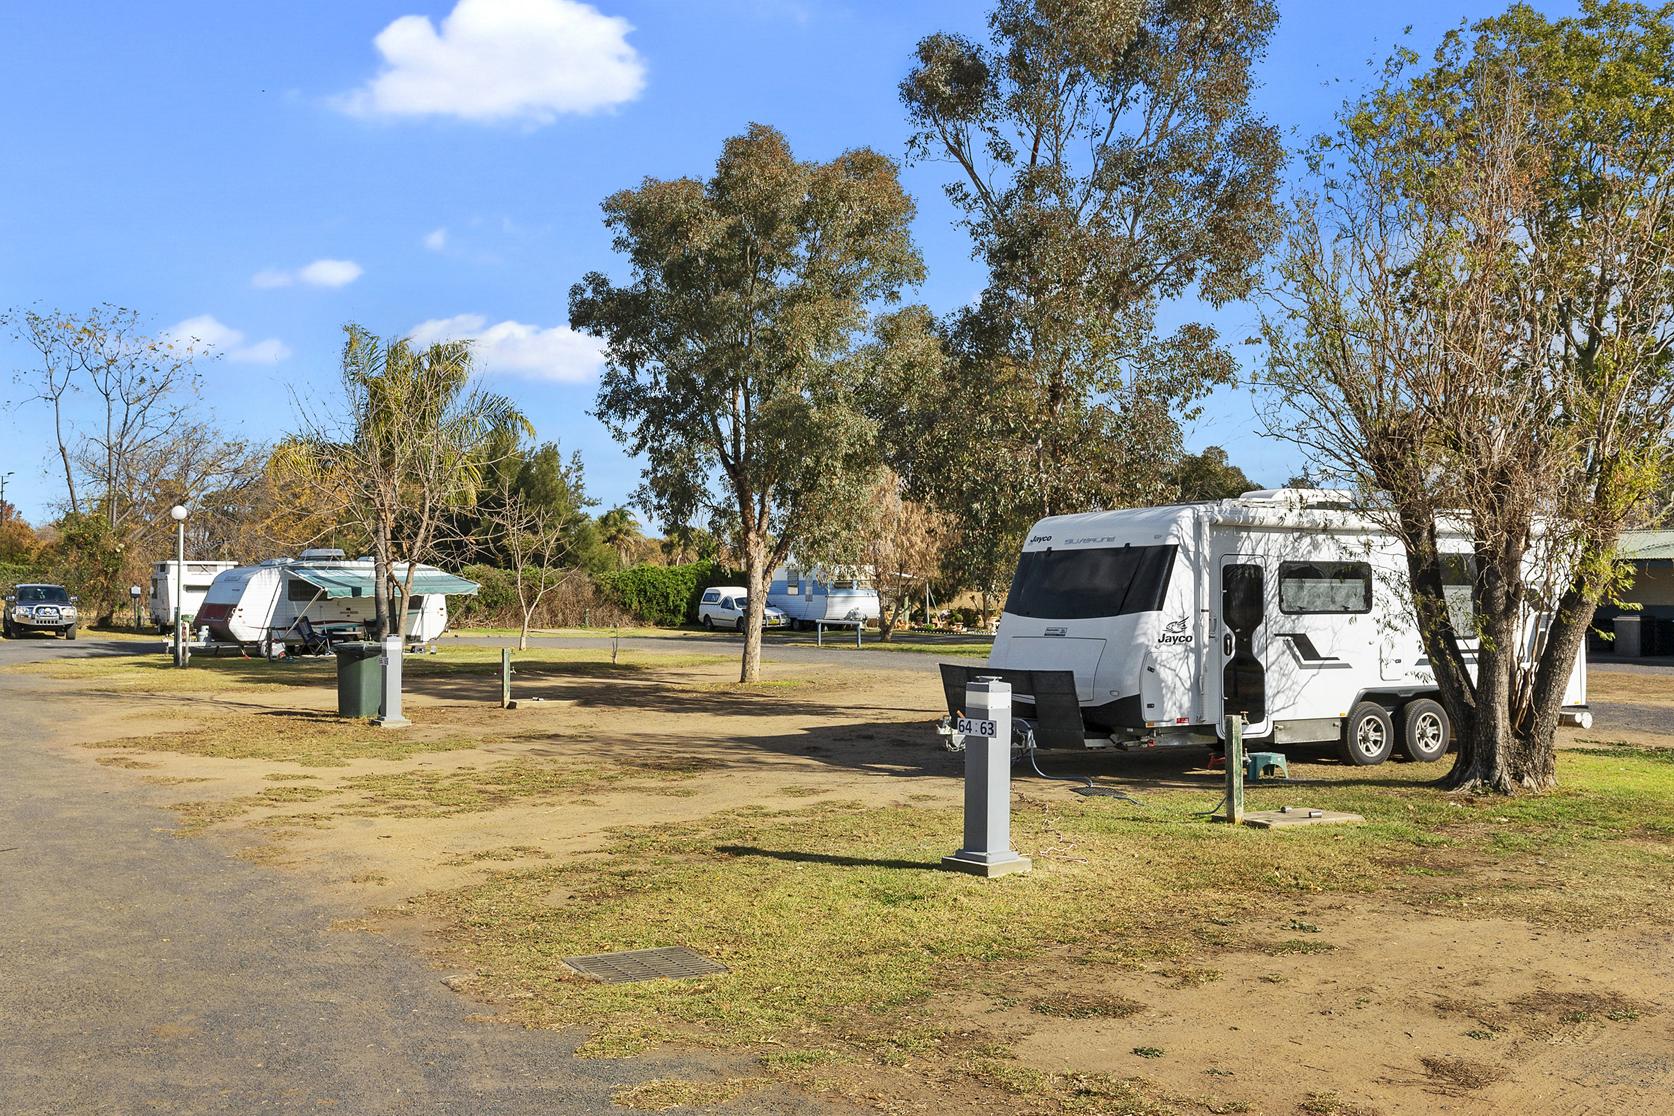 c - Dubbo Midstate Caravan Park